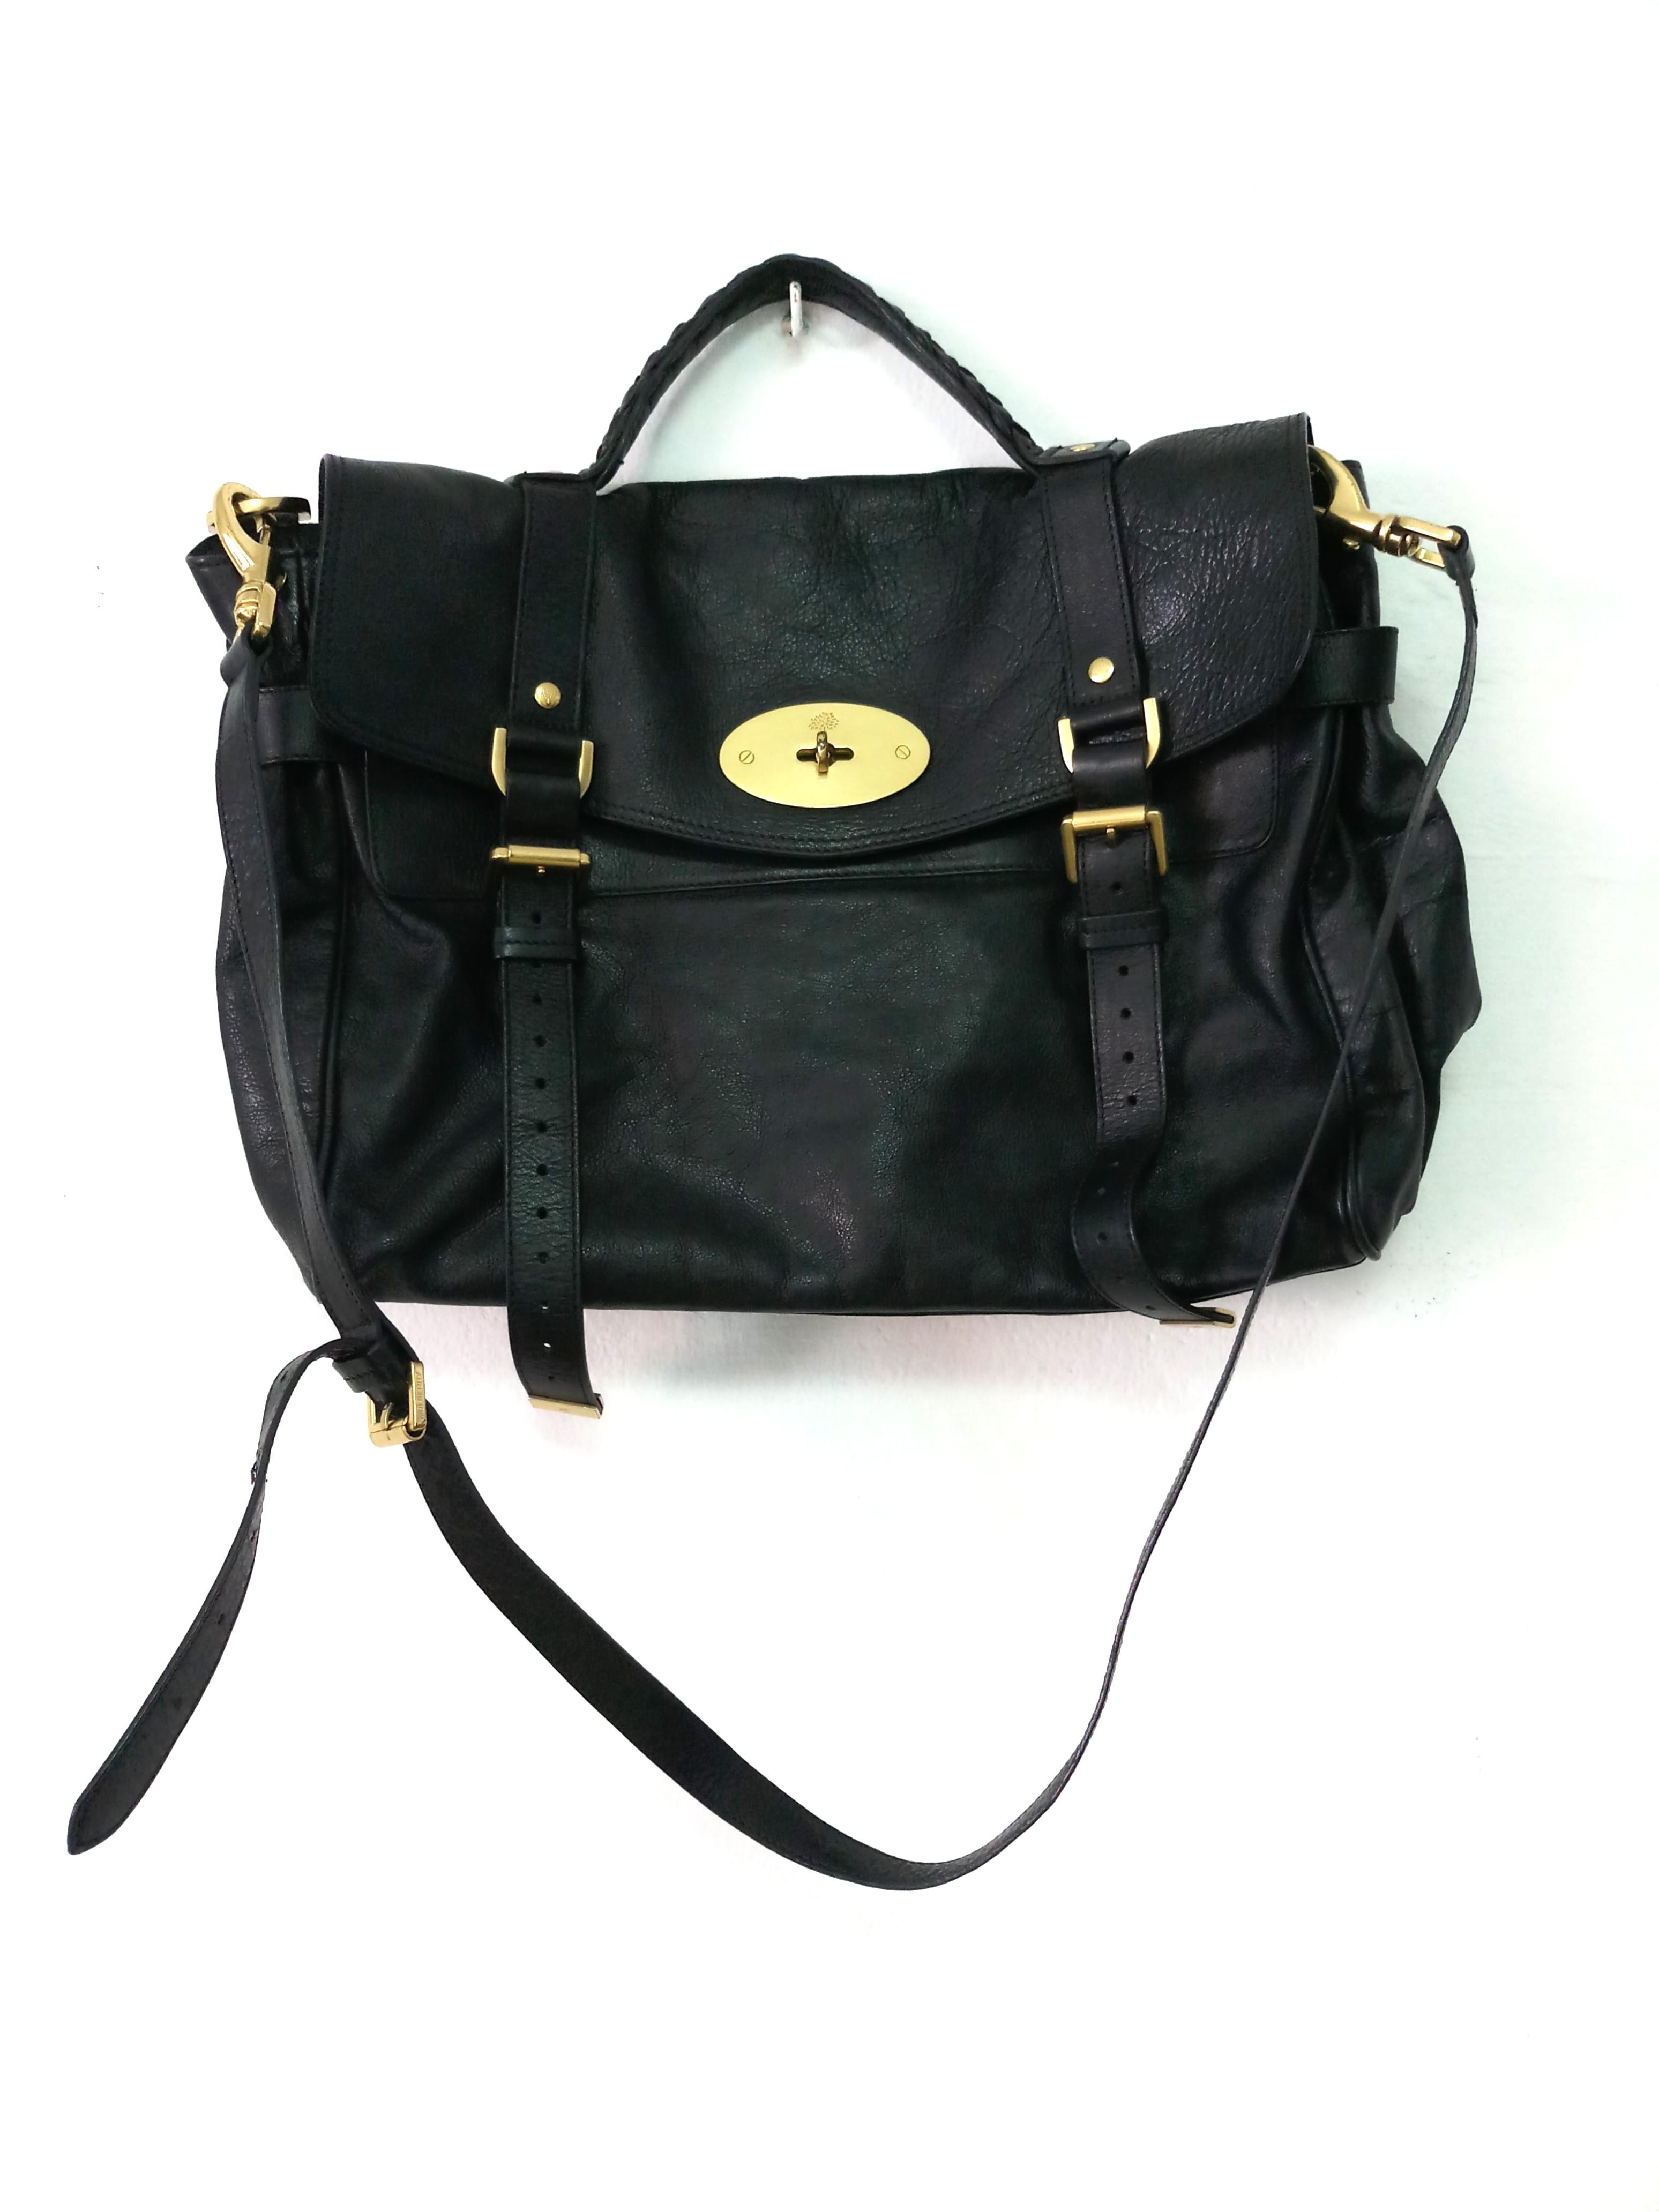 5b8239c28cd85 Classic Mulberry Oversized Alexa bag!